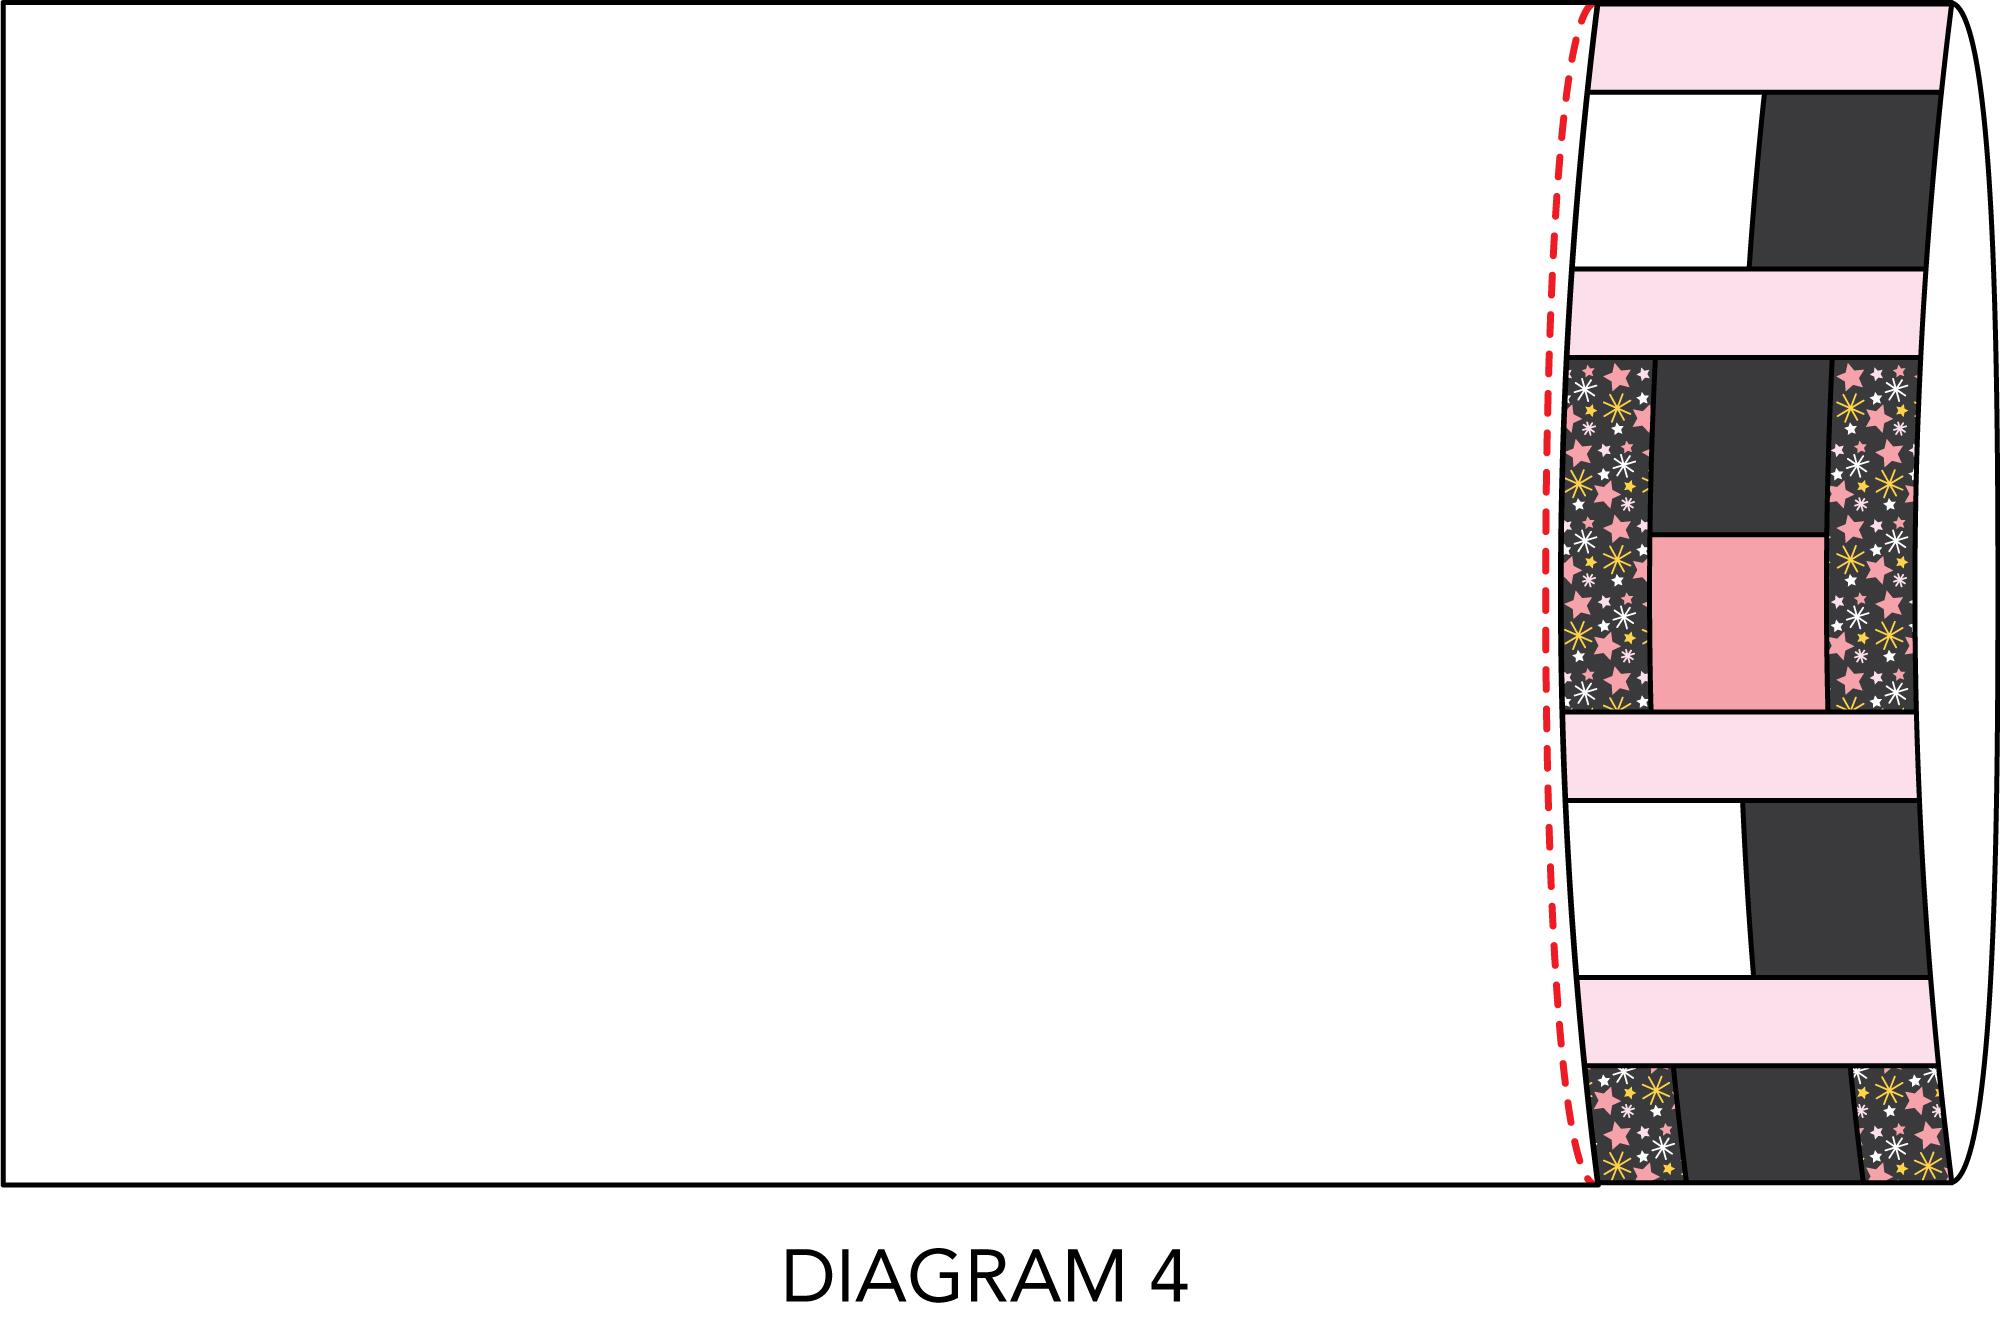 Dreamland pillowcase diagram 4